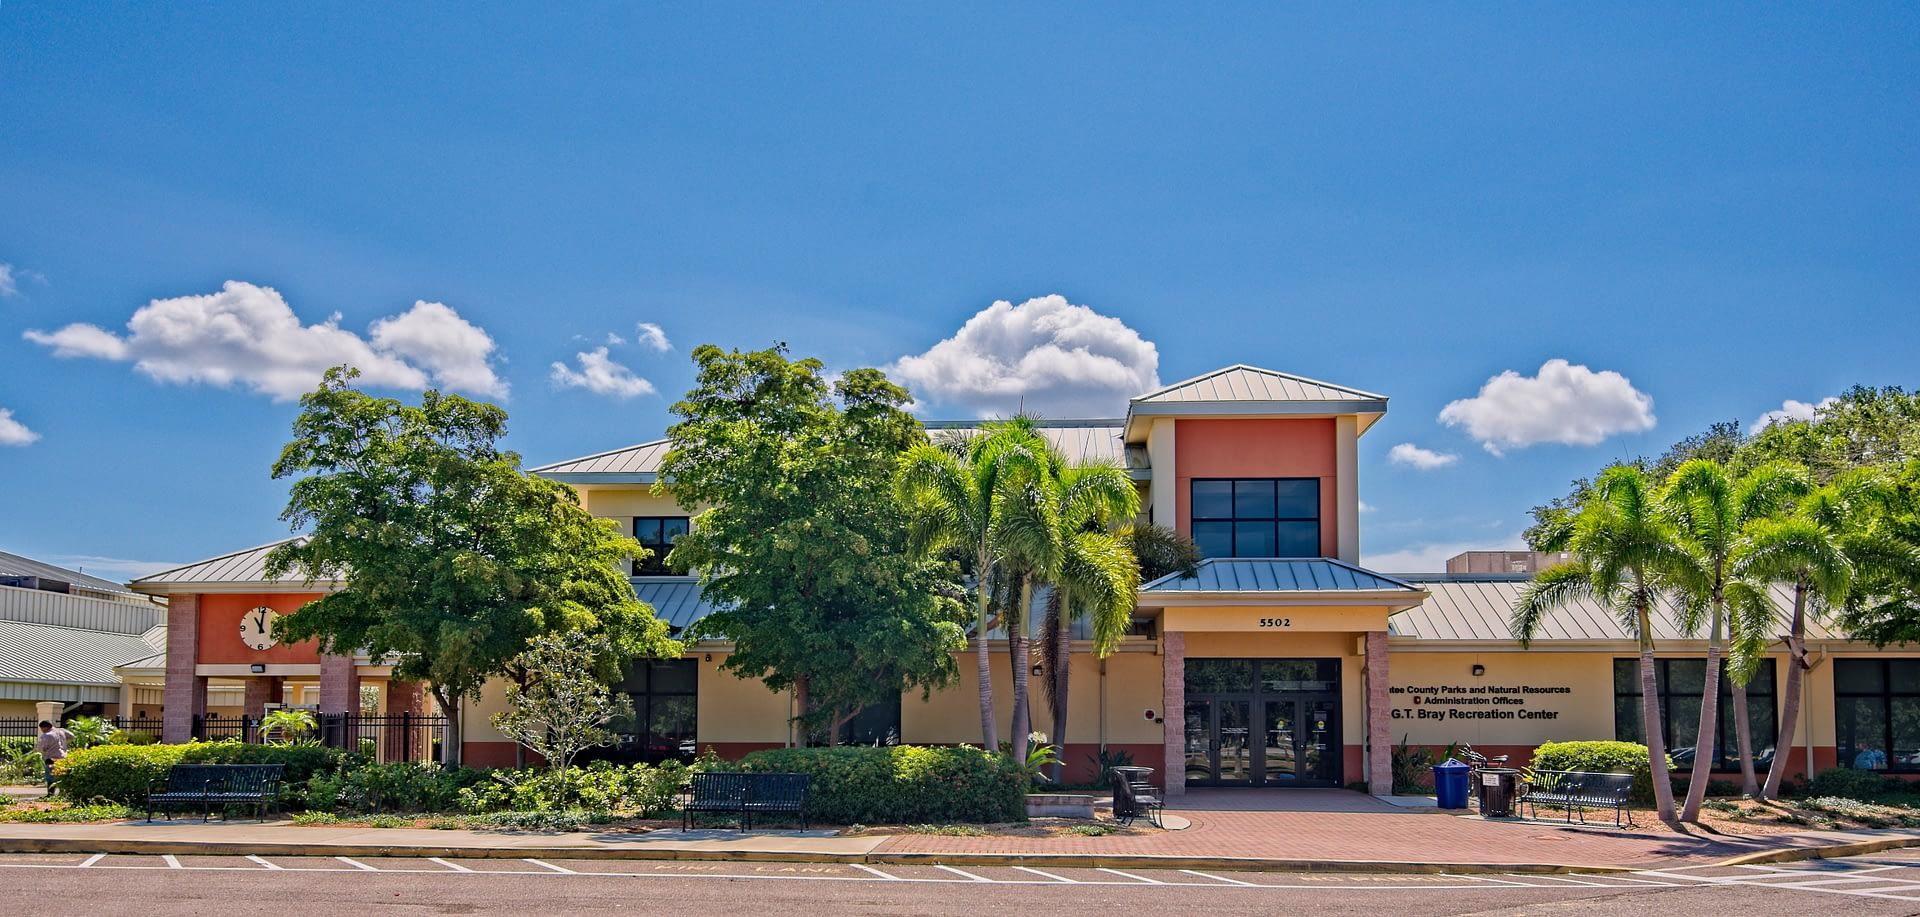 GT Bray Rec Center5502 33rd Ave Dr W, Bradenton, FL 34209